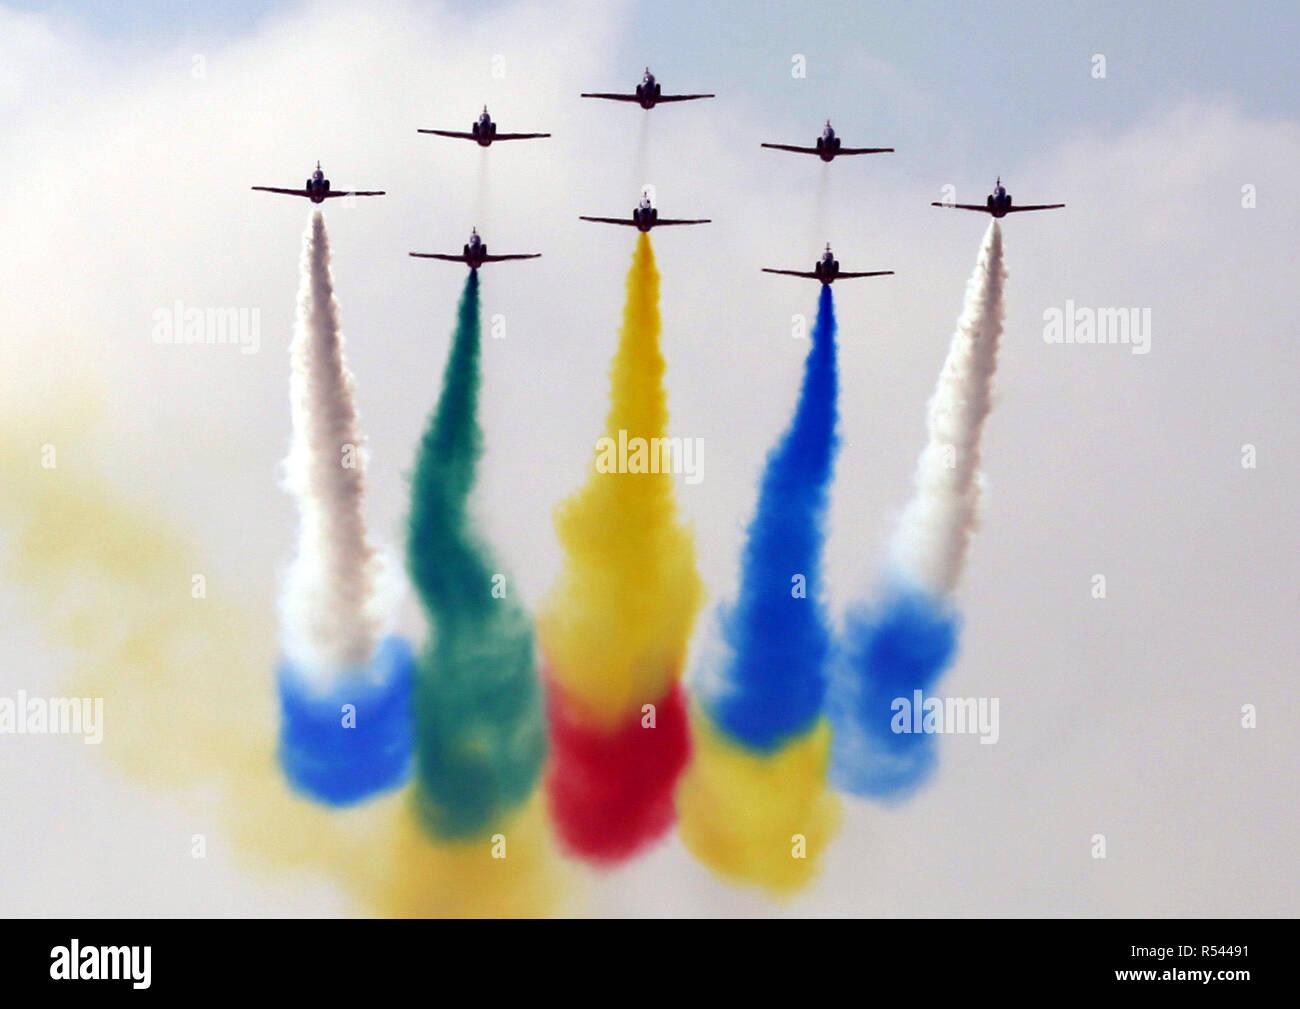 Zhuhai, China. 29 Nov, 2018. Las flechas rojas acrobático equipo realice en Zhuhai Airshow 2018 en Zhuhai, al sur de la Provincia china de Guangdong. Crédito: SIPA Asia/Zuma alambre/Alamy Live News Imagen De Stock